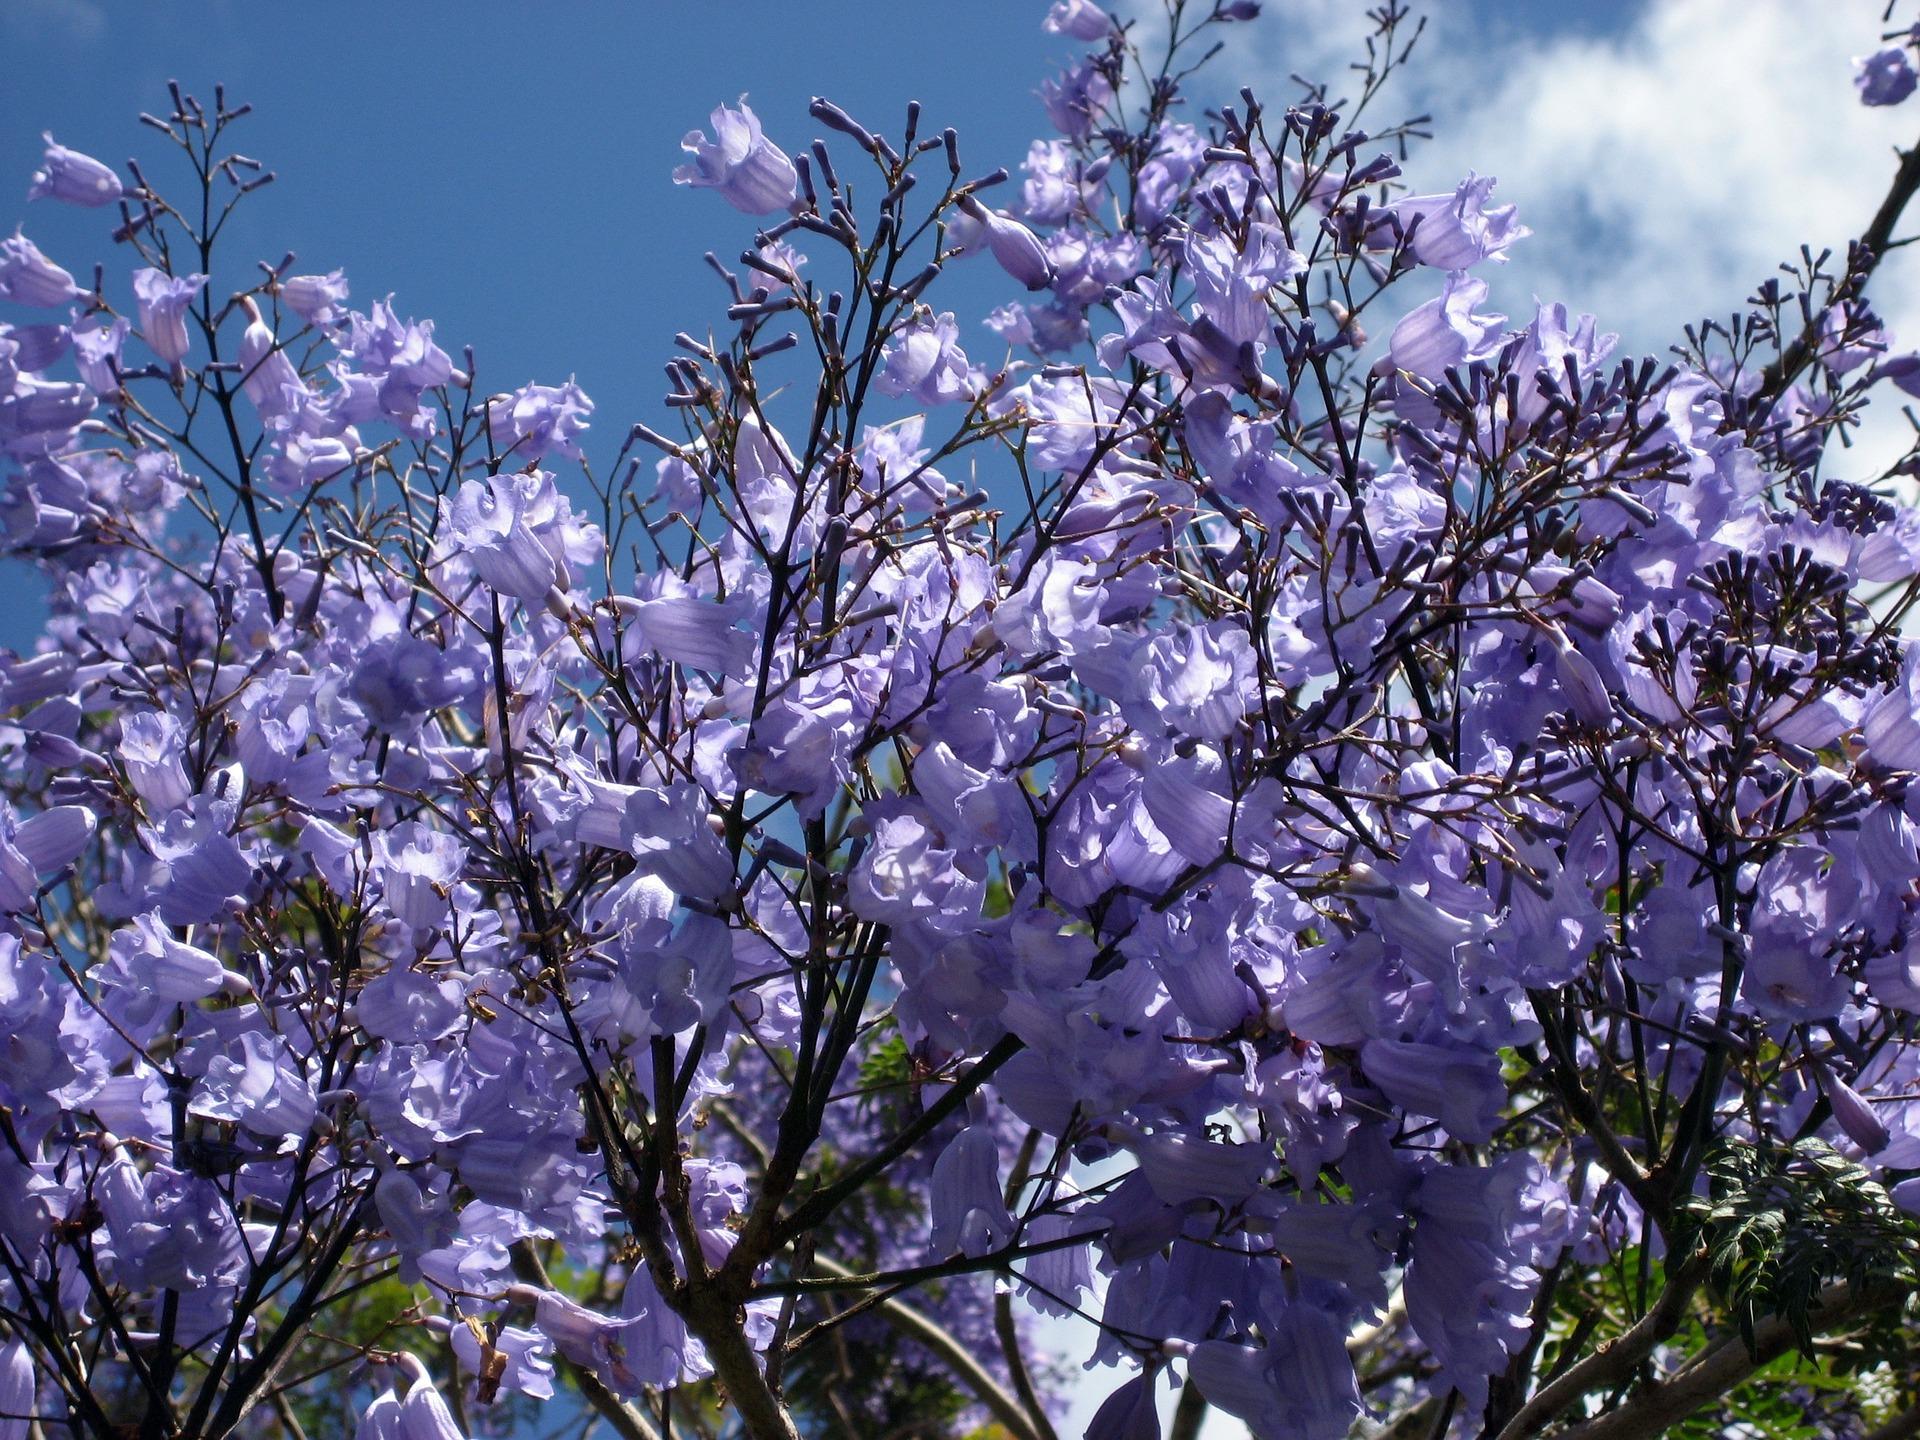 jacaranda-blossoms-1168957_1920